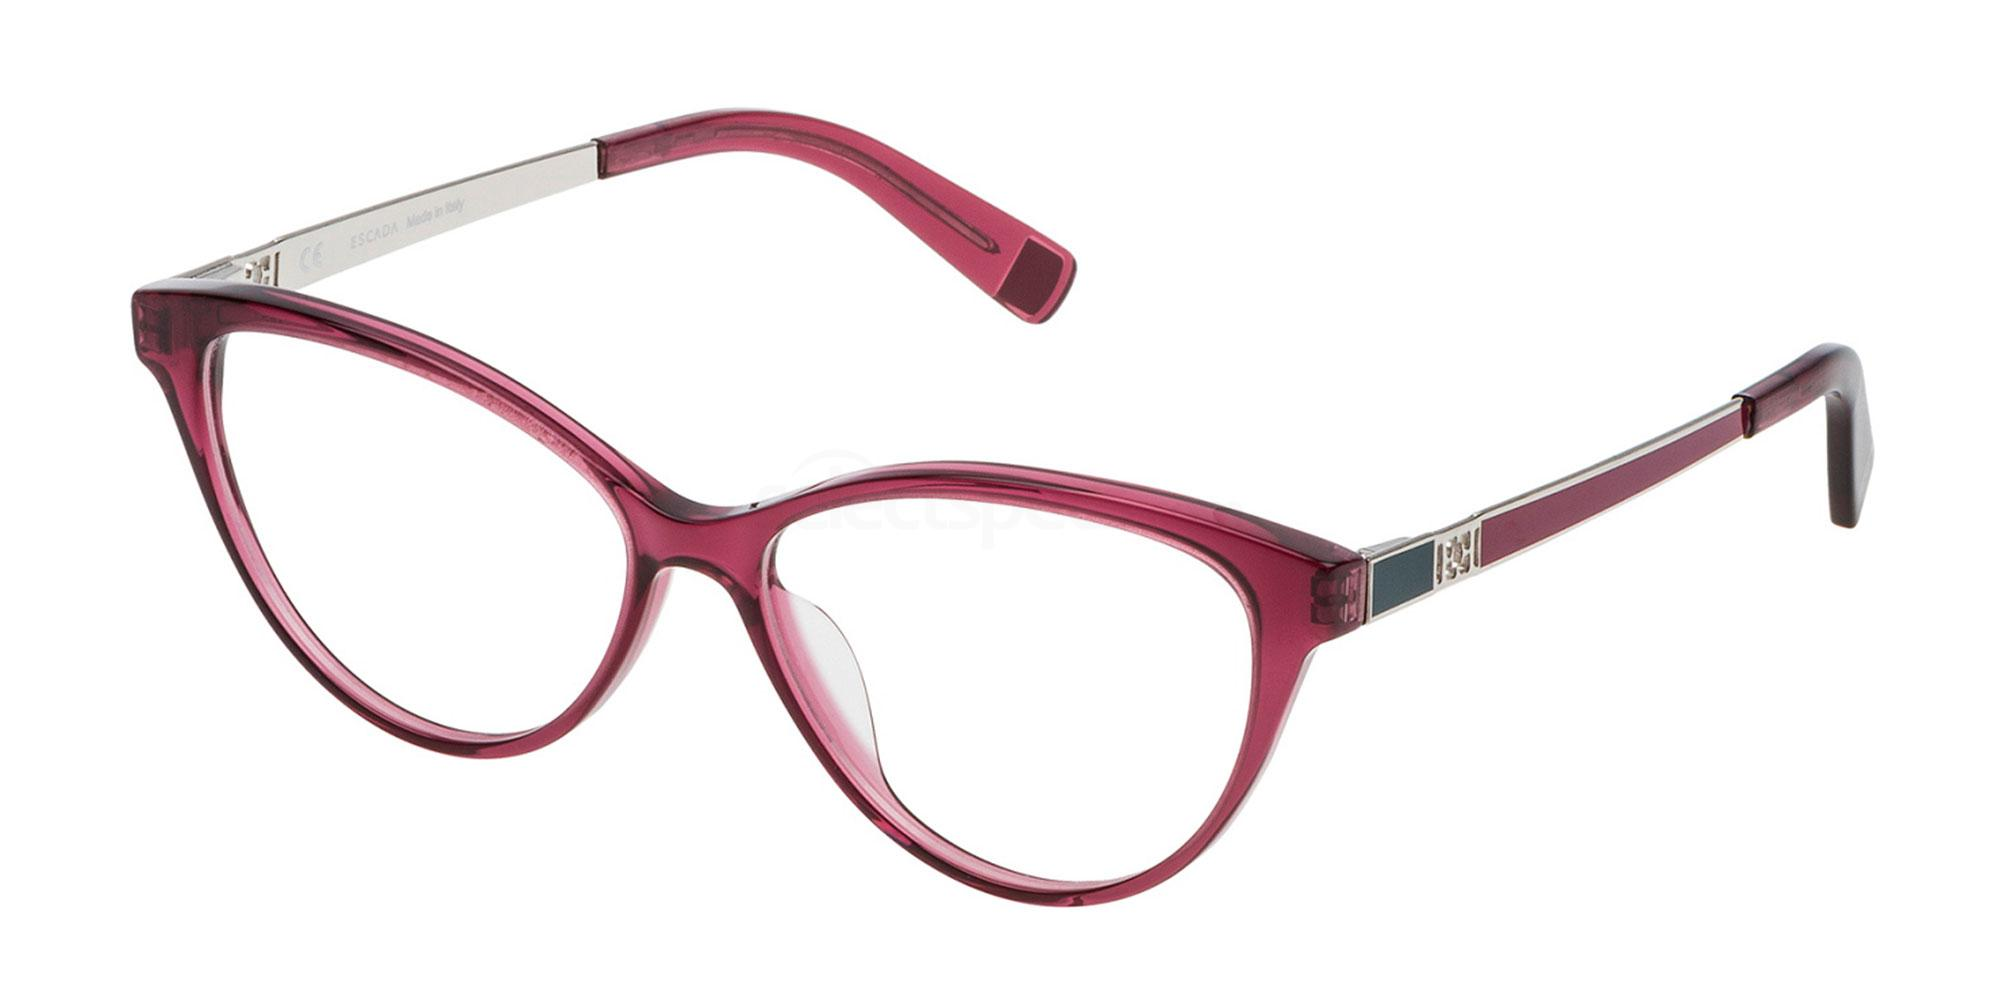 0916 VES466 Glasses, Escada